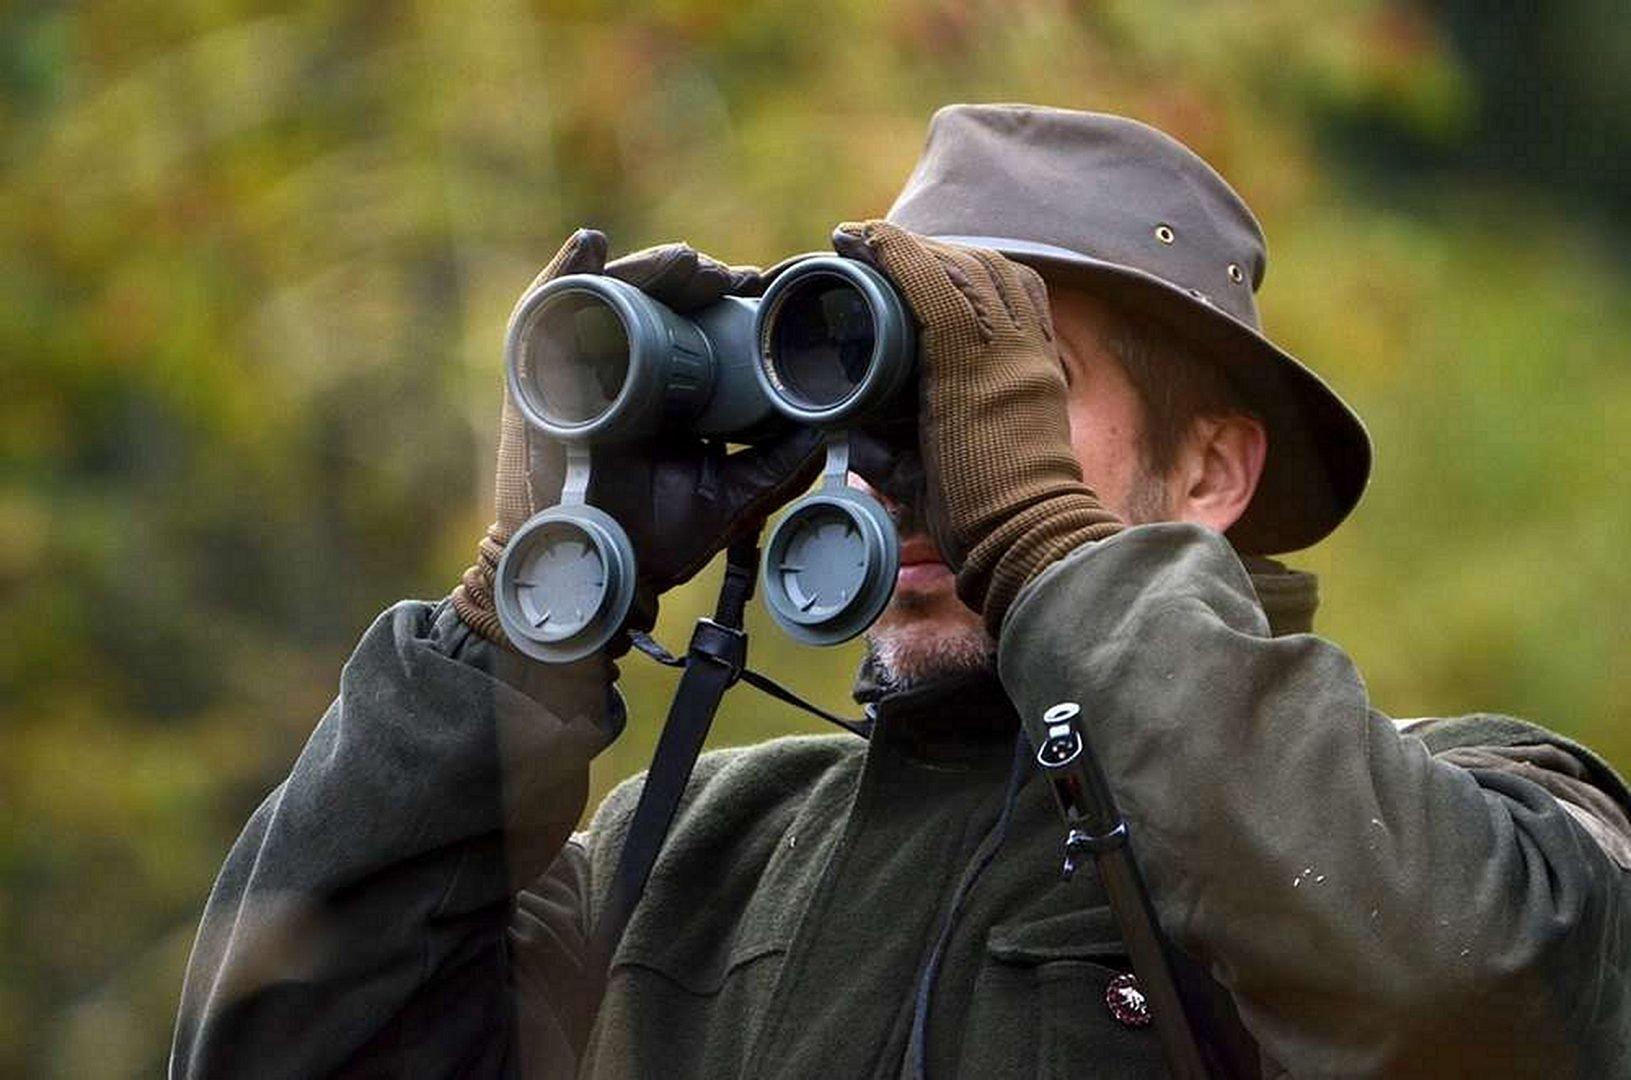 Man in a Hat looks through Binoculars